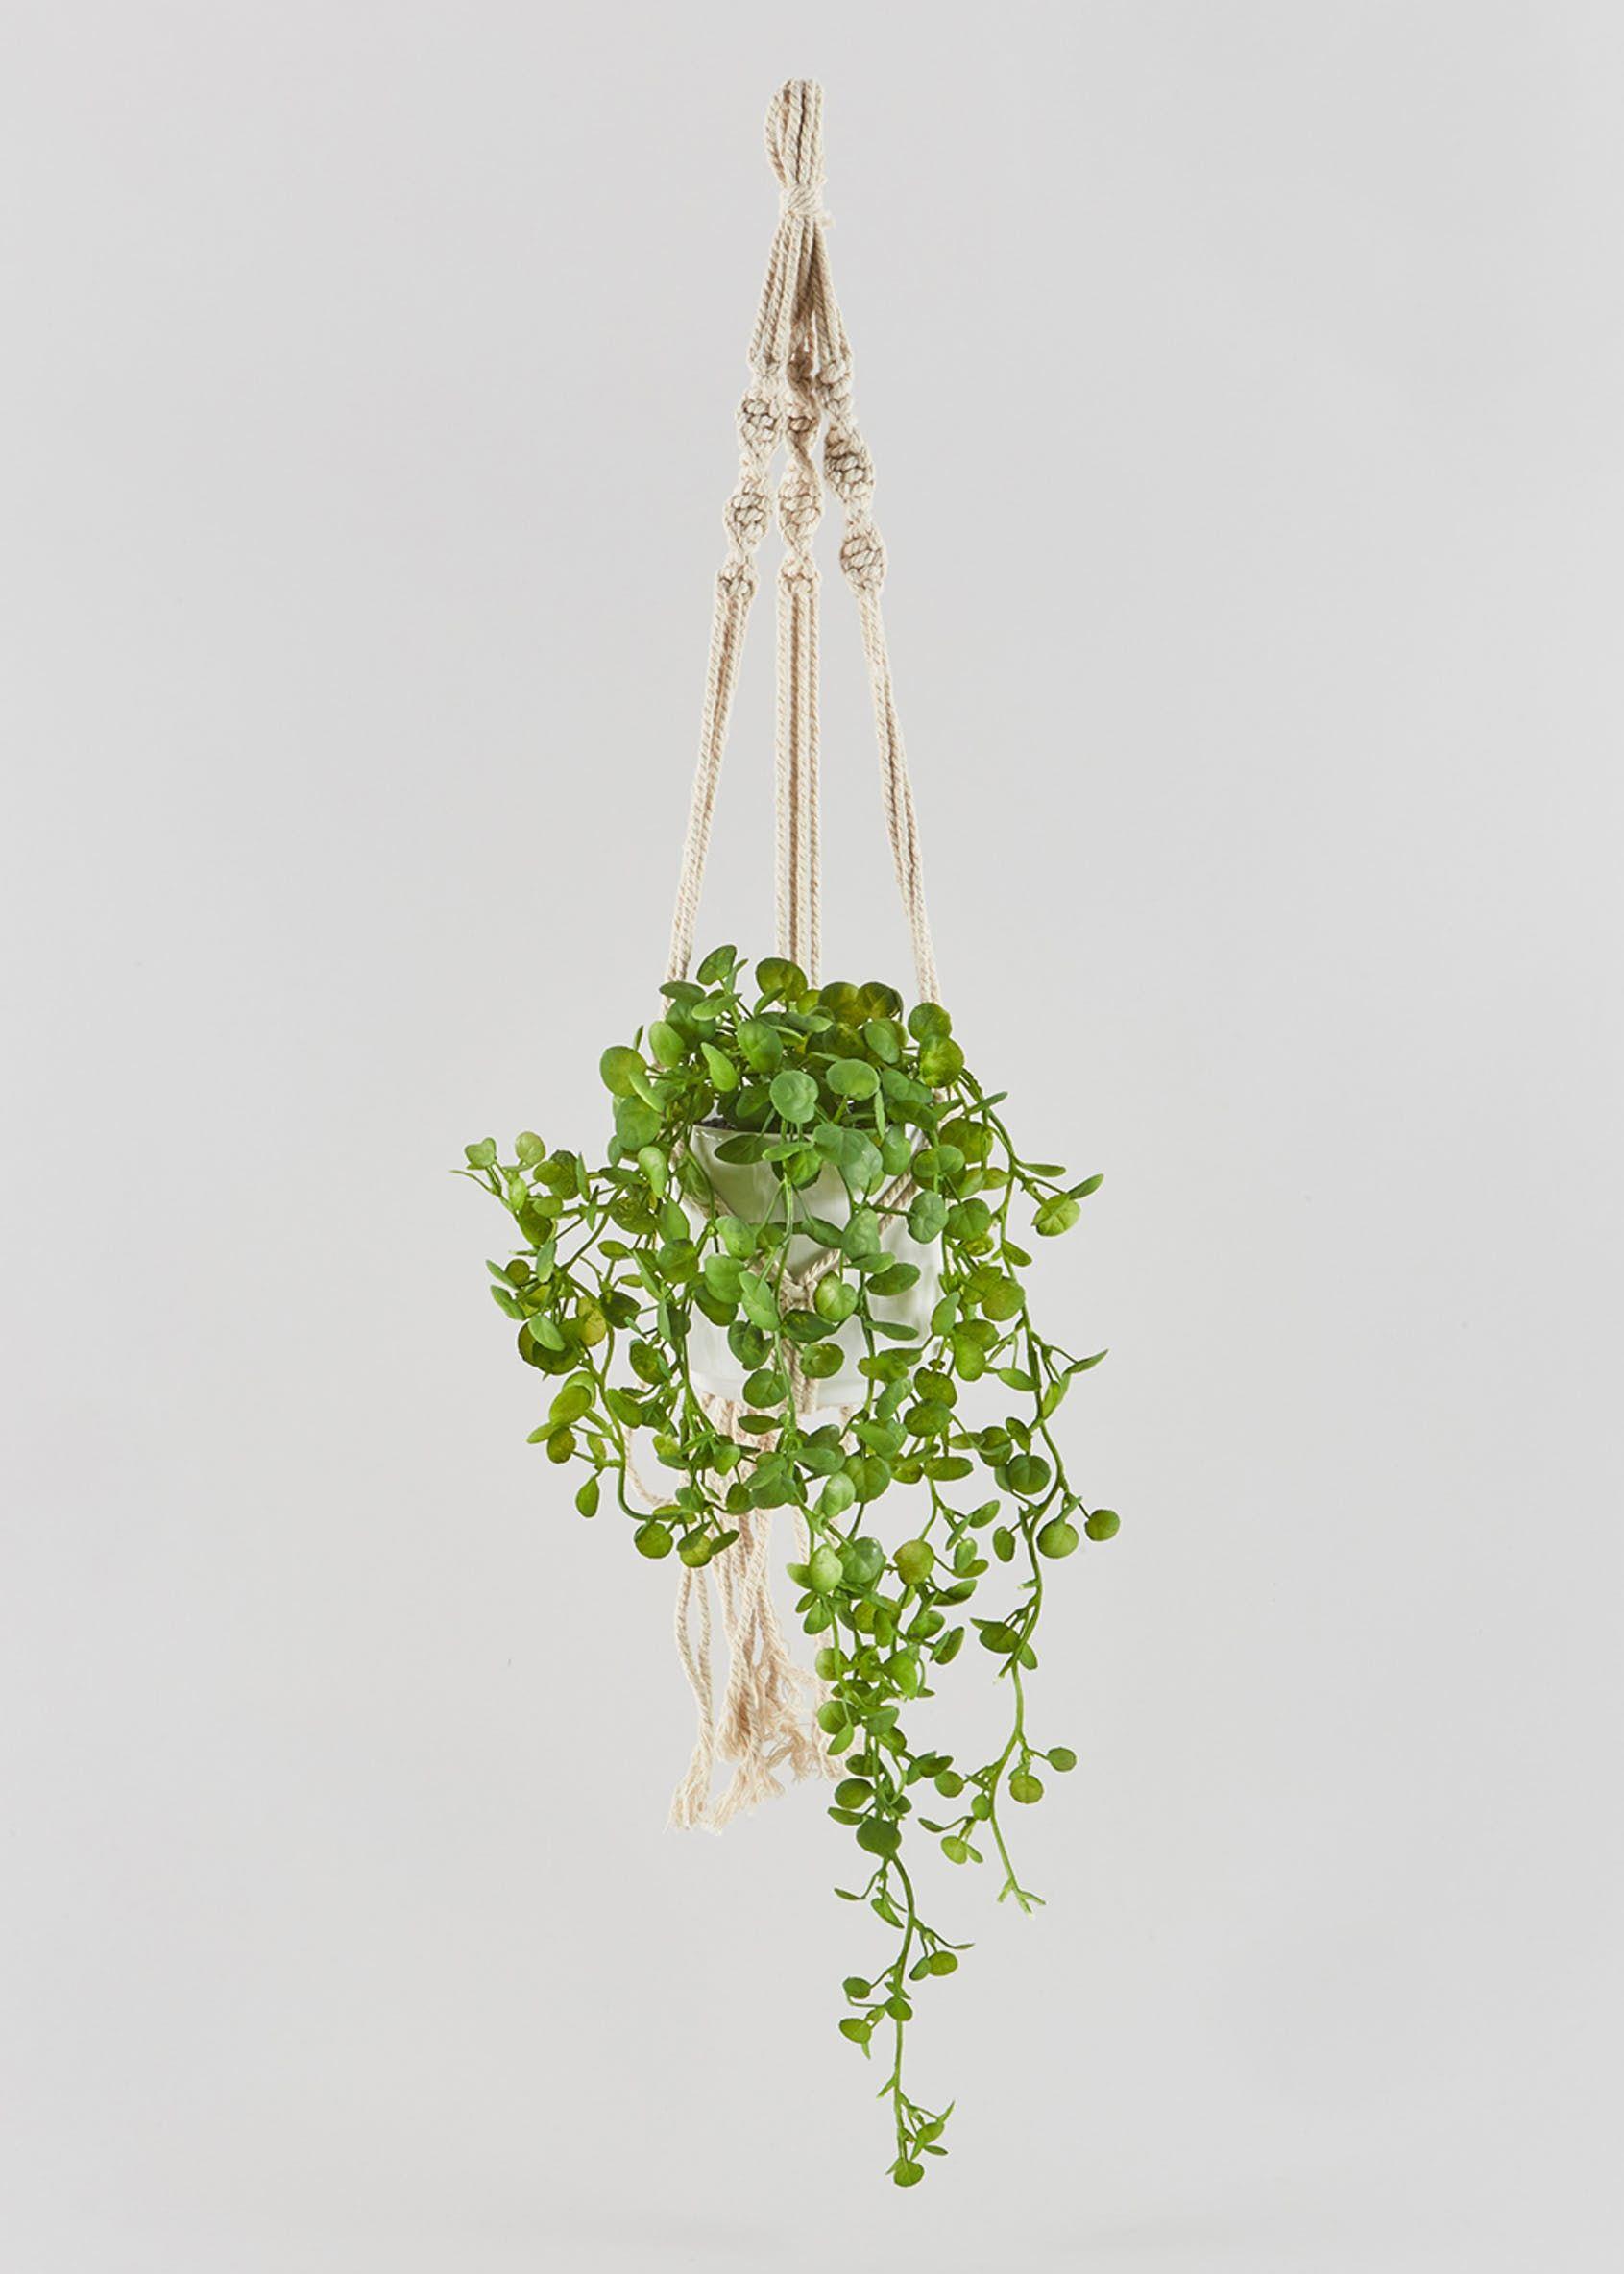 Hanging Plant 60cm Green Hanging Plants Artificial Hanging Plants Small Artificial Plants